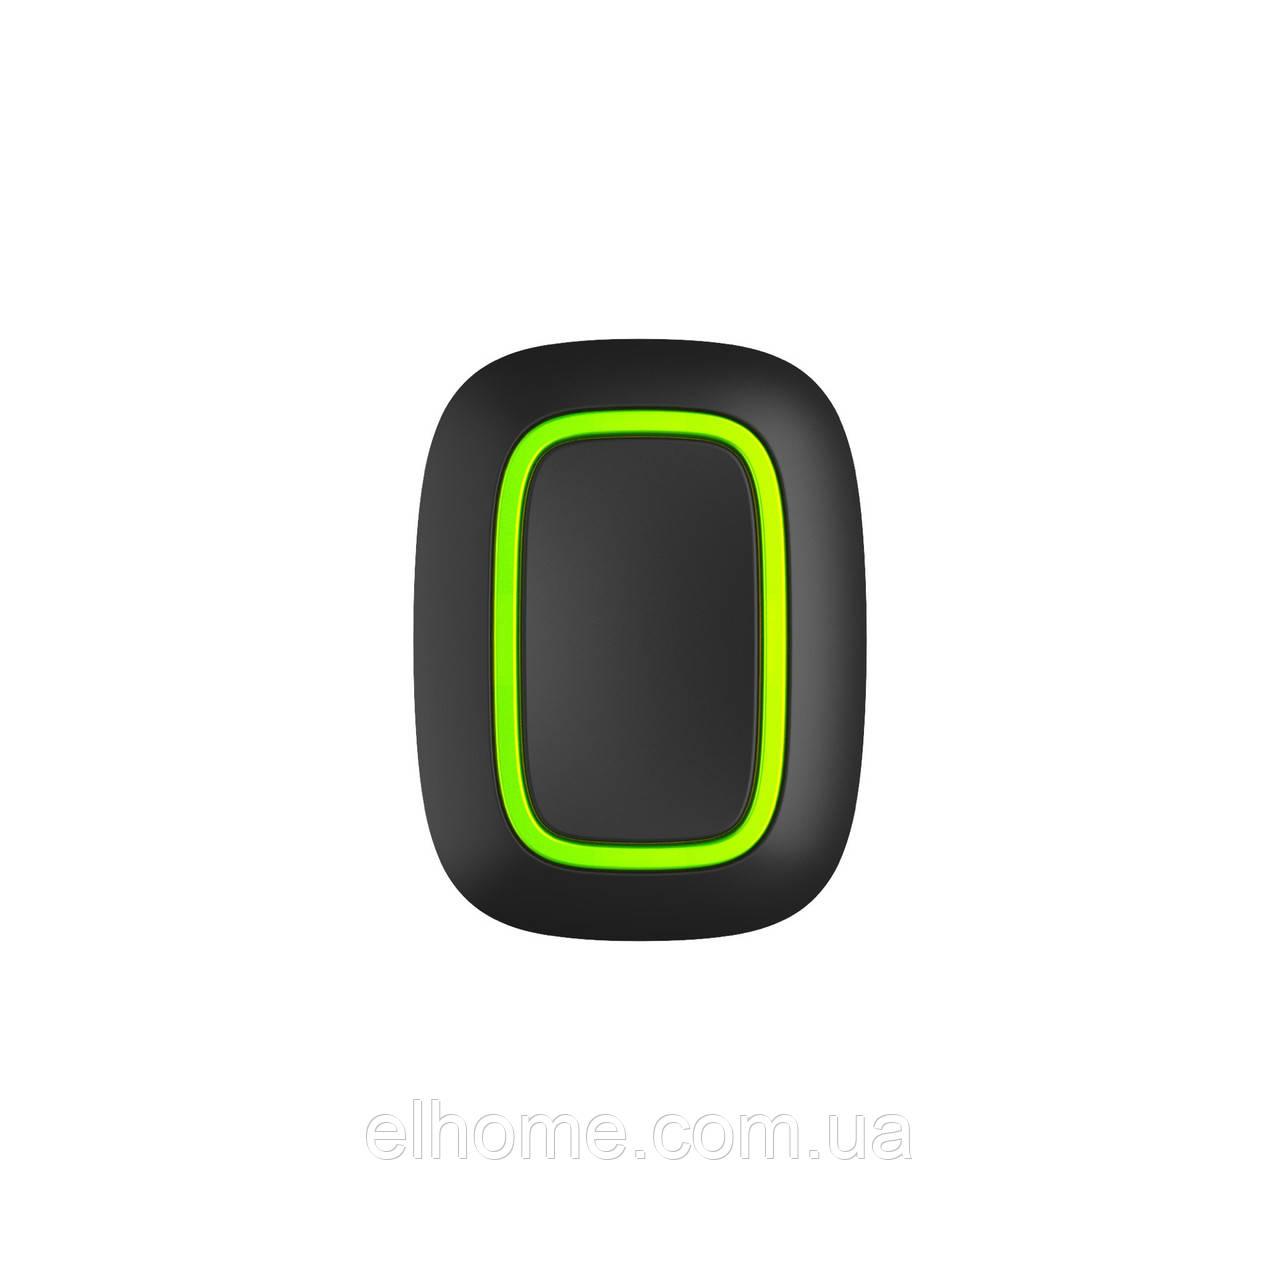 Тривожна кнопка Ajax Button чорна